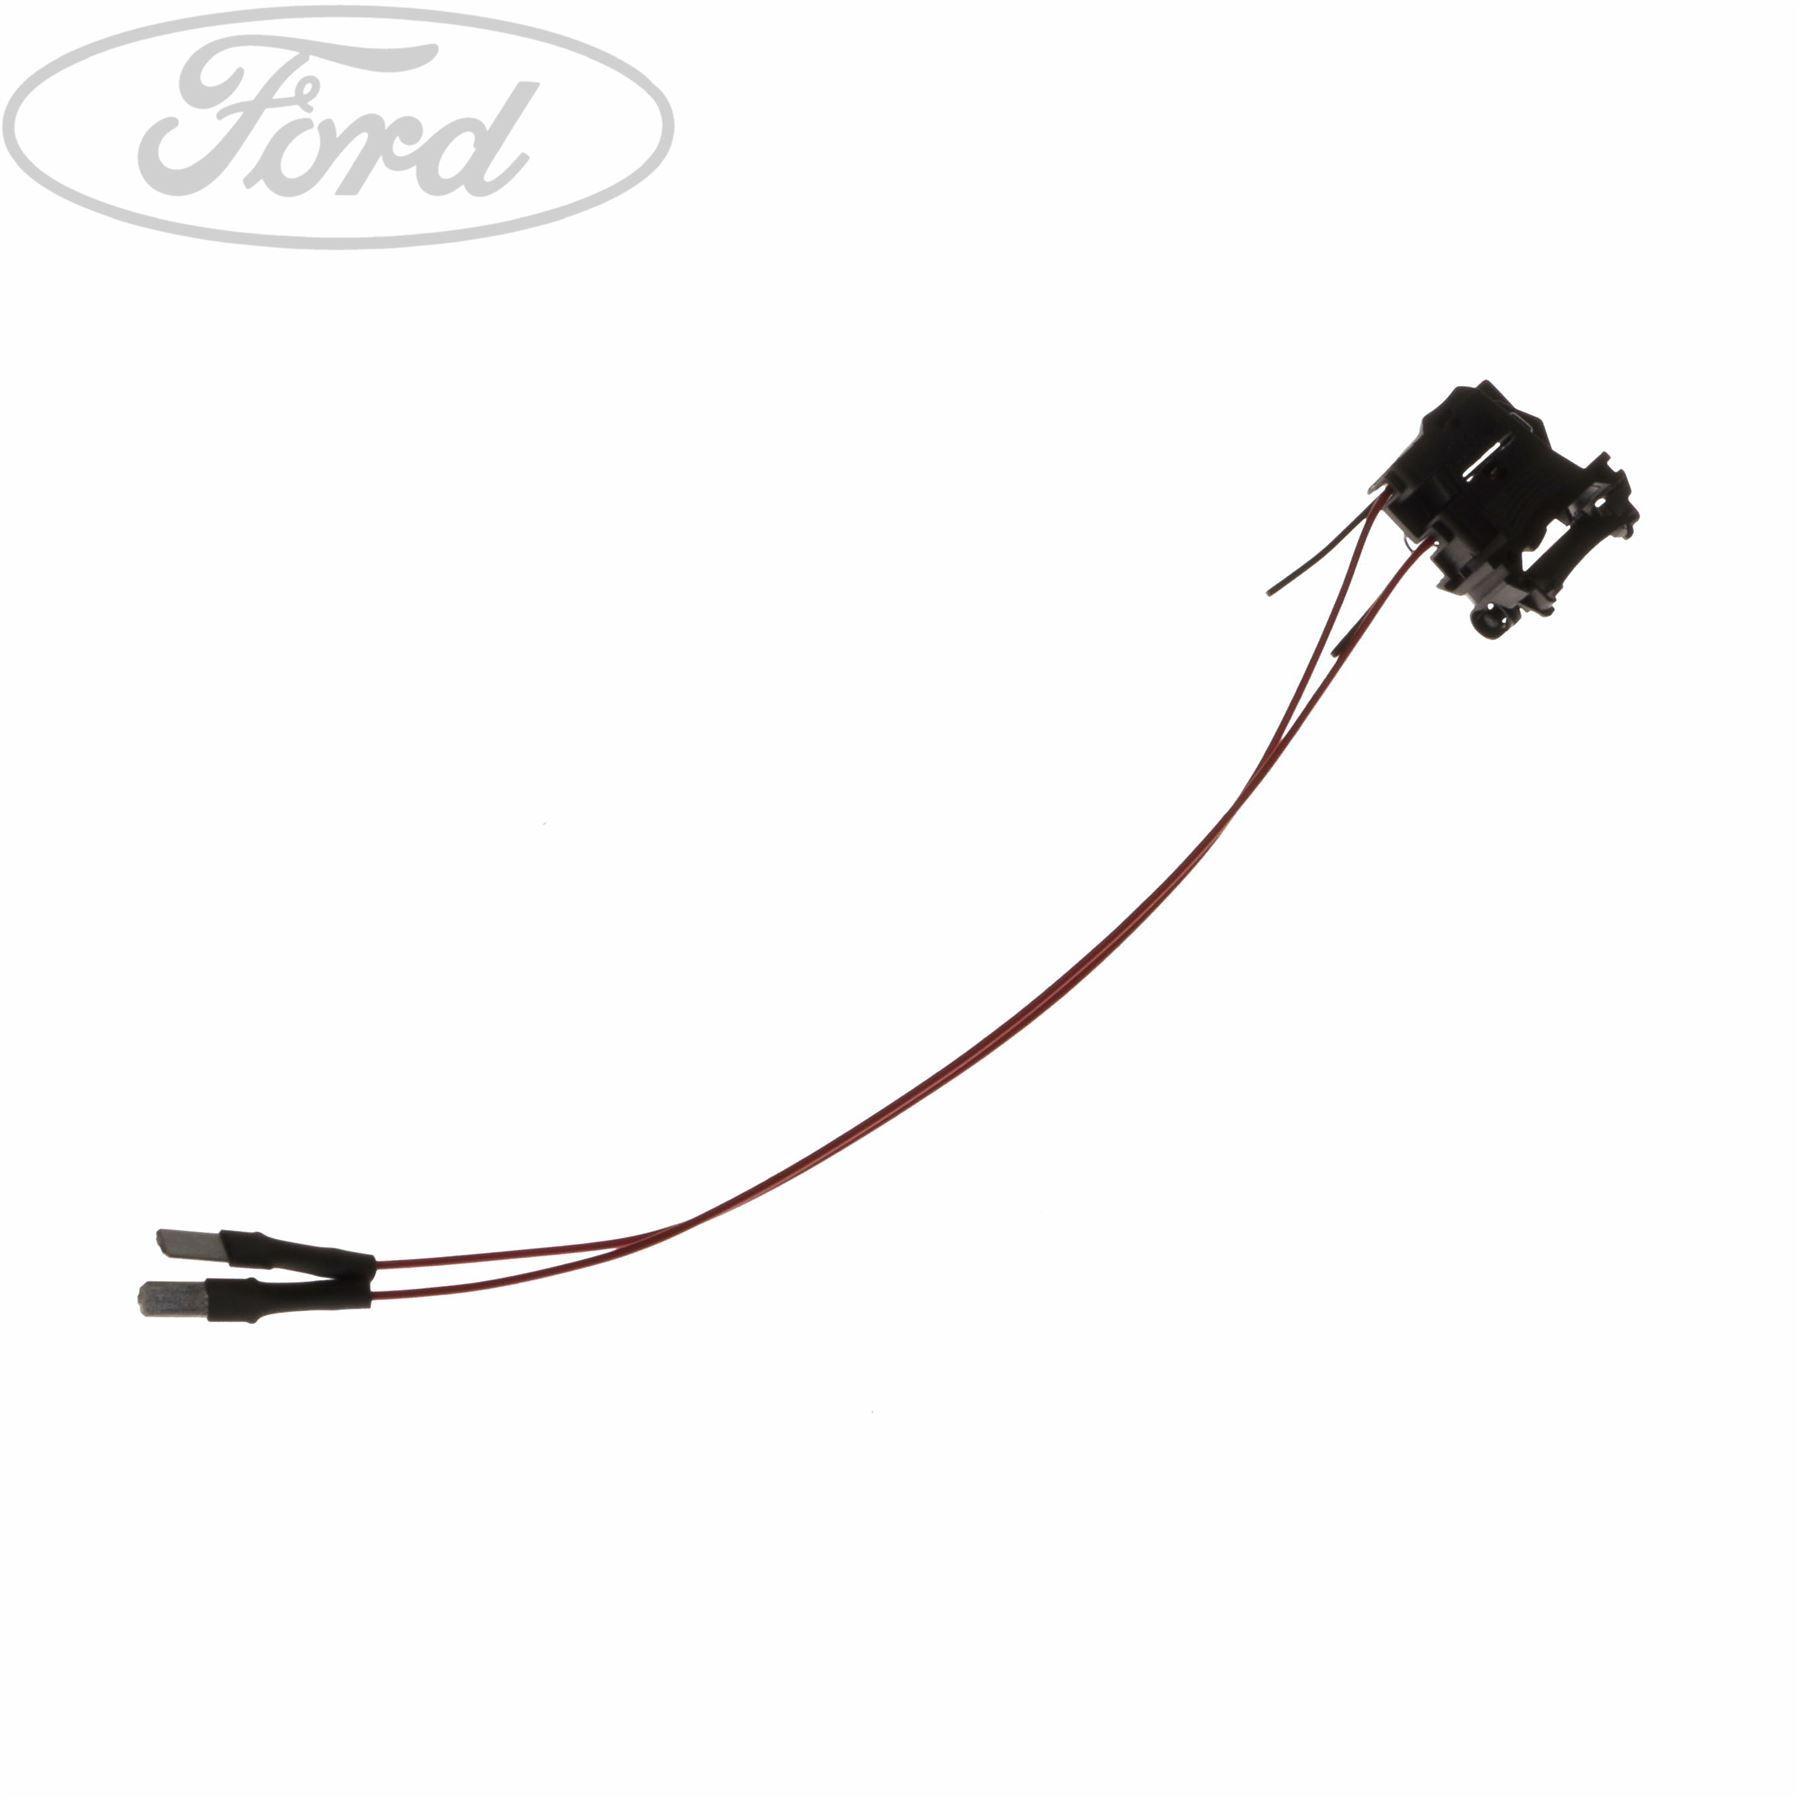 Genuine Ford Focus Mk Ii Front Headlight Resistor Wiring 1758231 Ebay Accessories